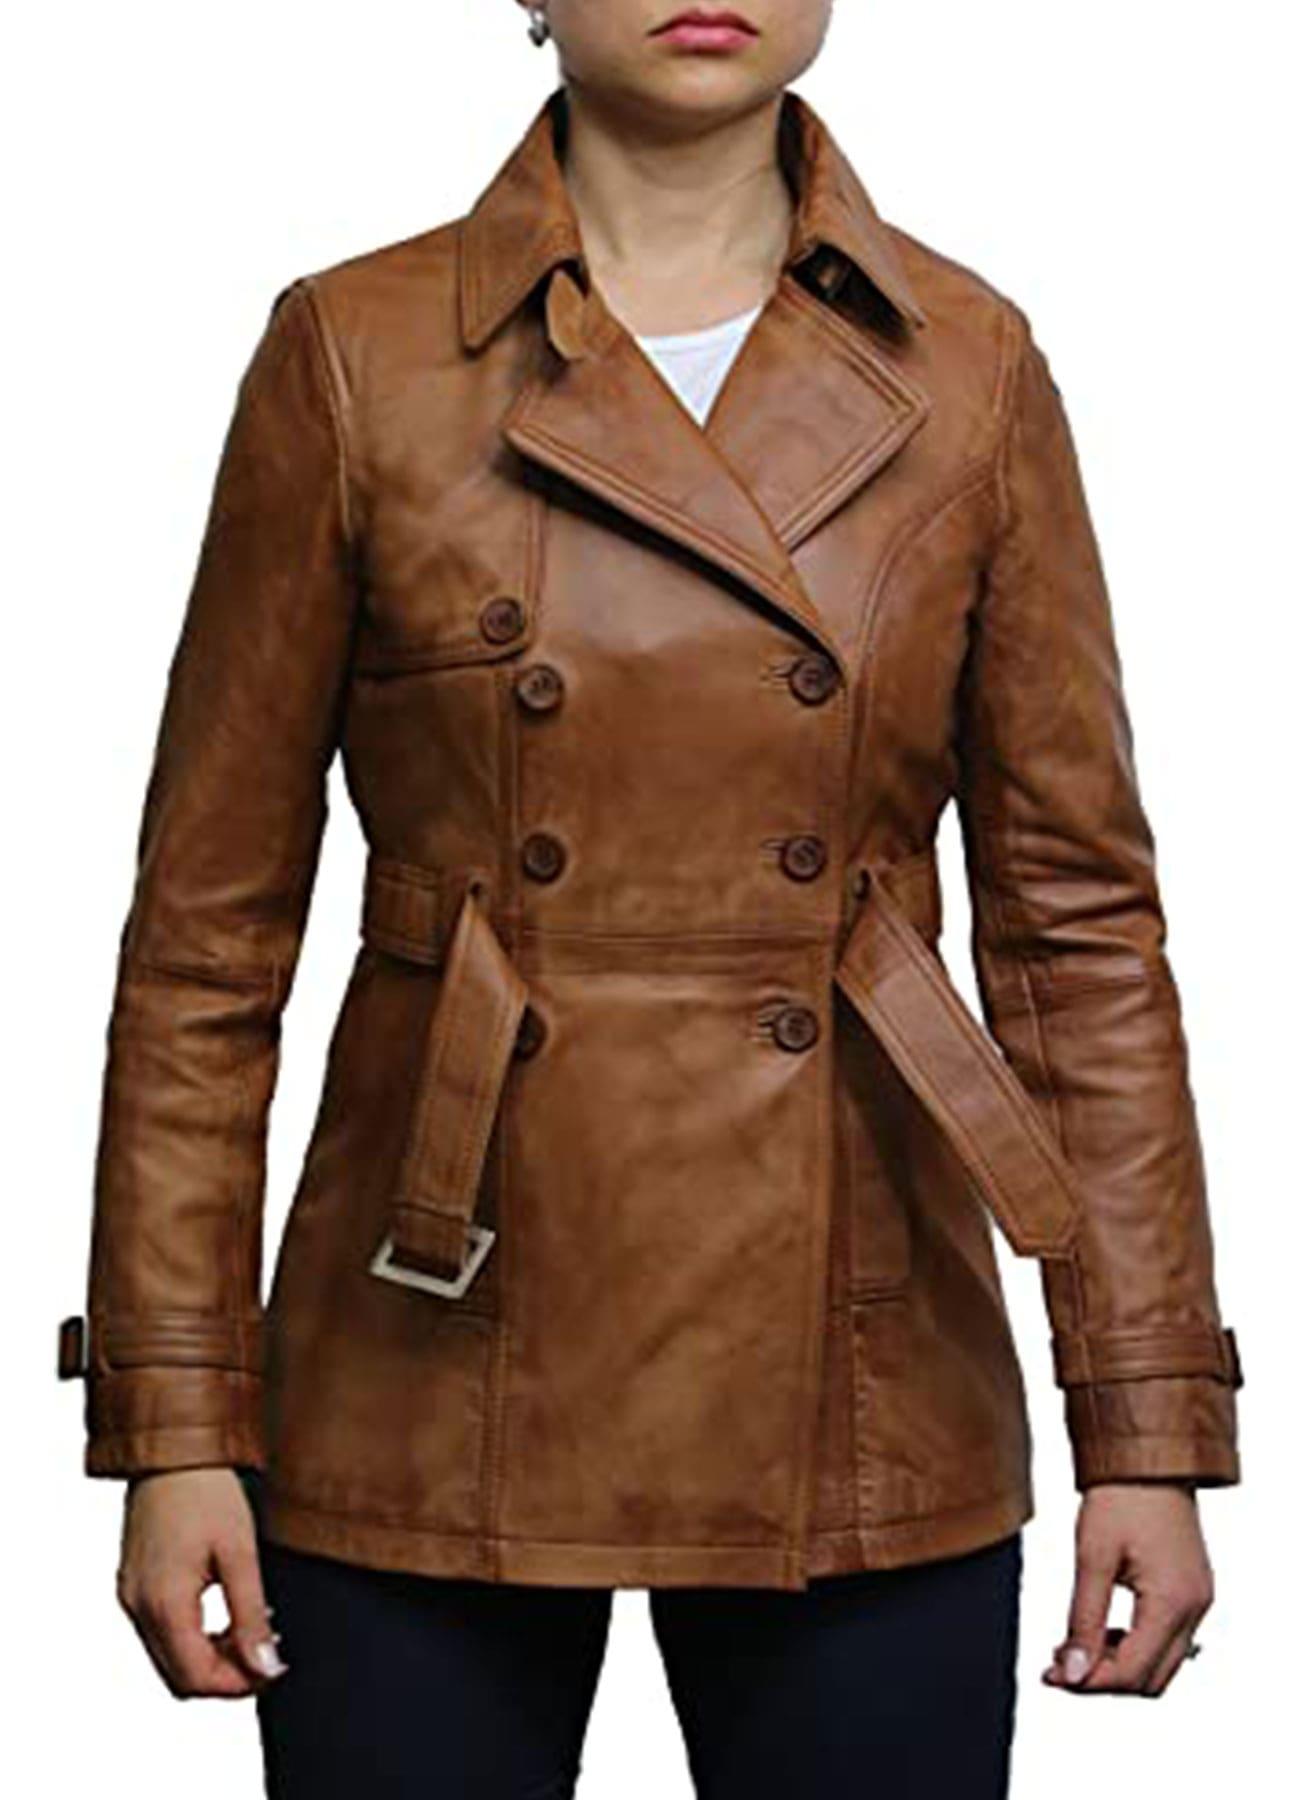 Women's Fashion Biker Jacket Coat Tan Superior Real Leather